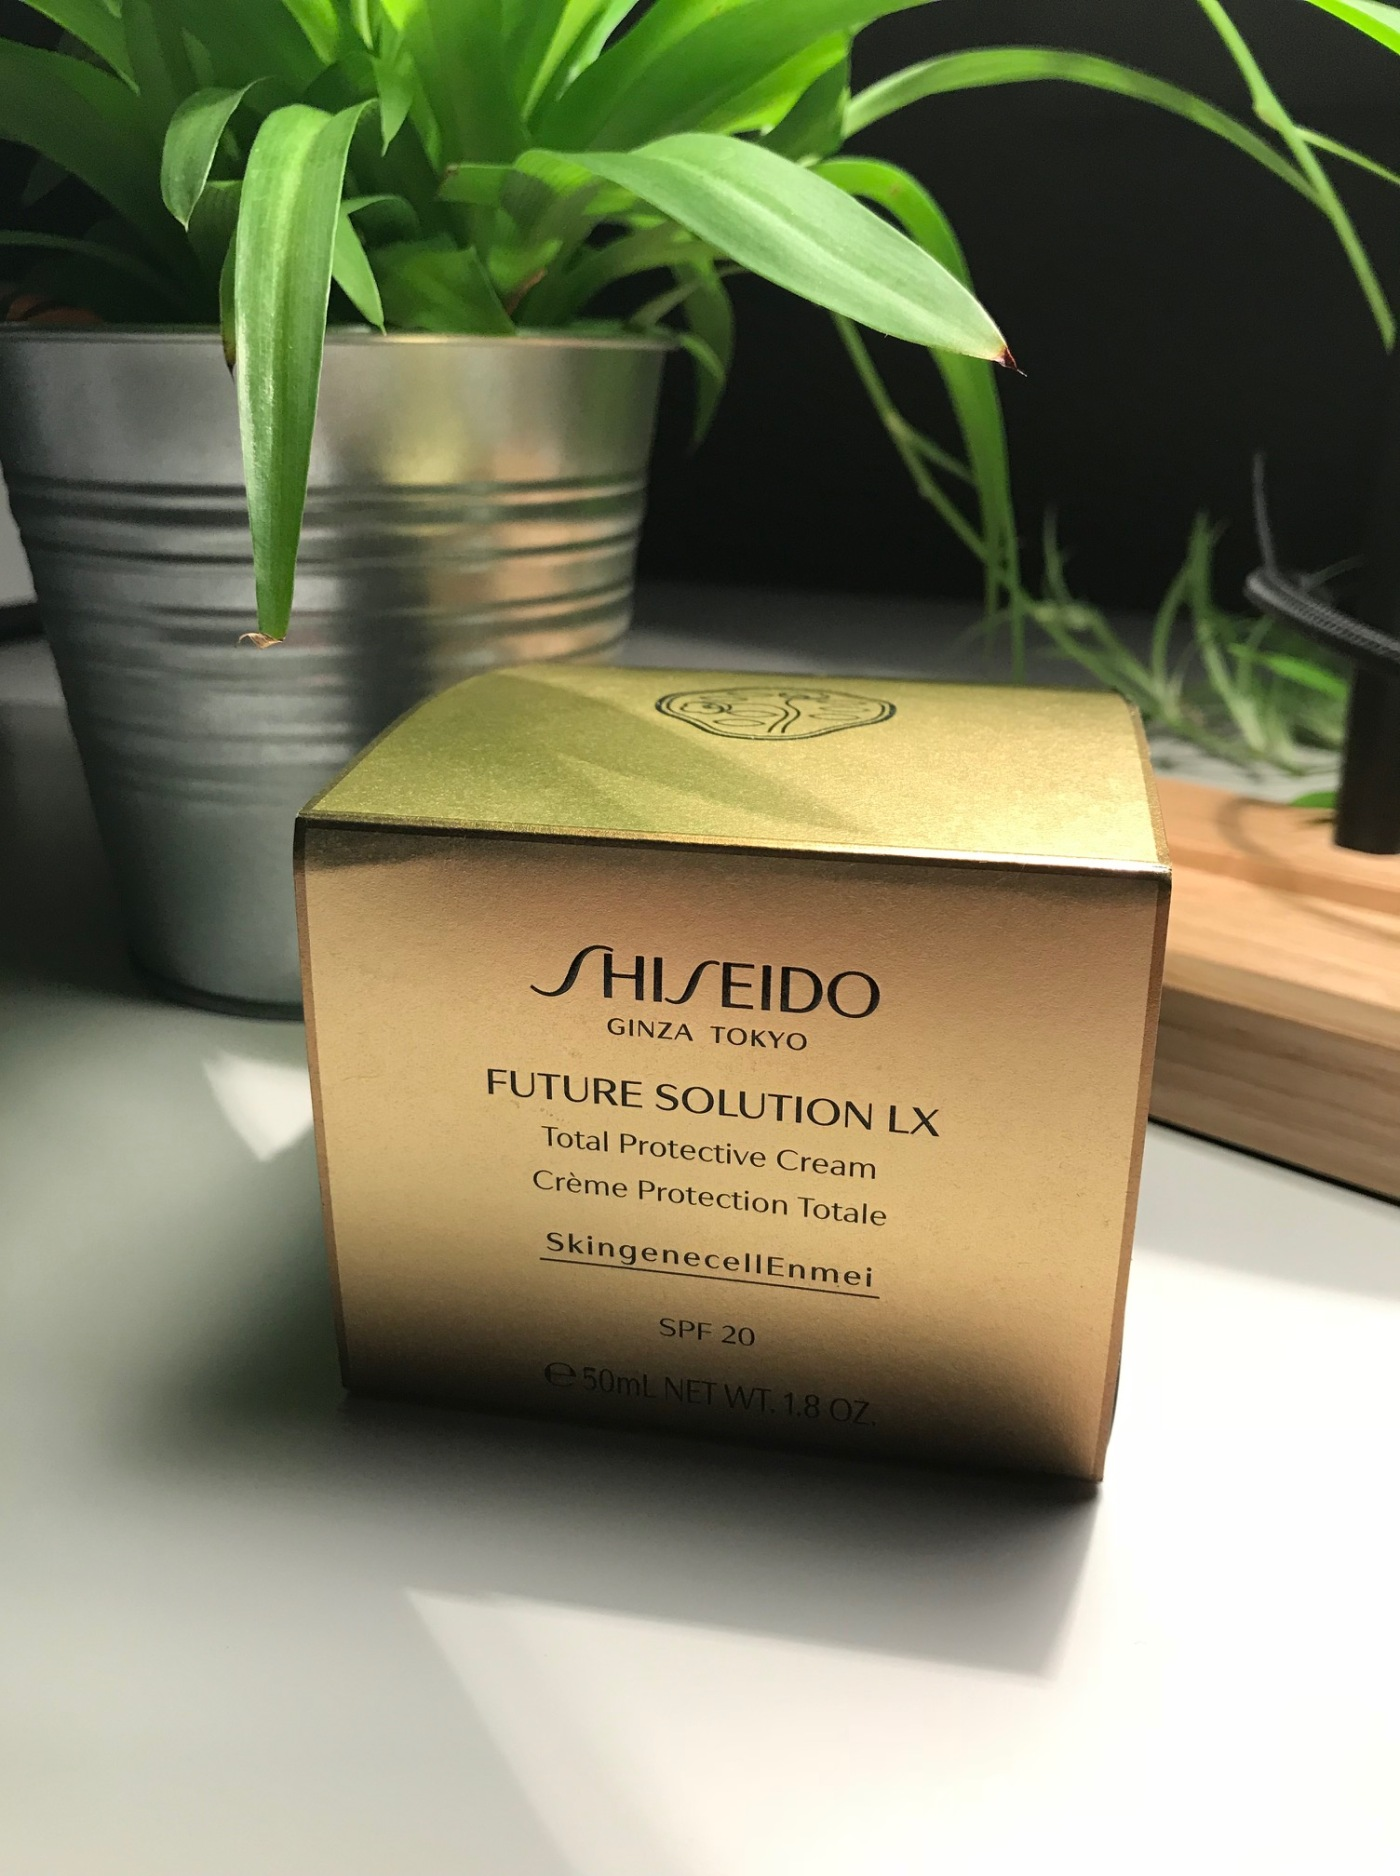 shiseido_futuresolutionlx_packaging